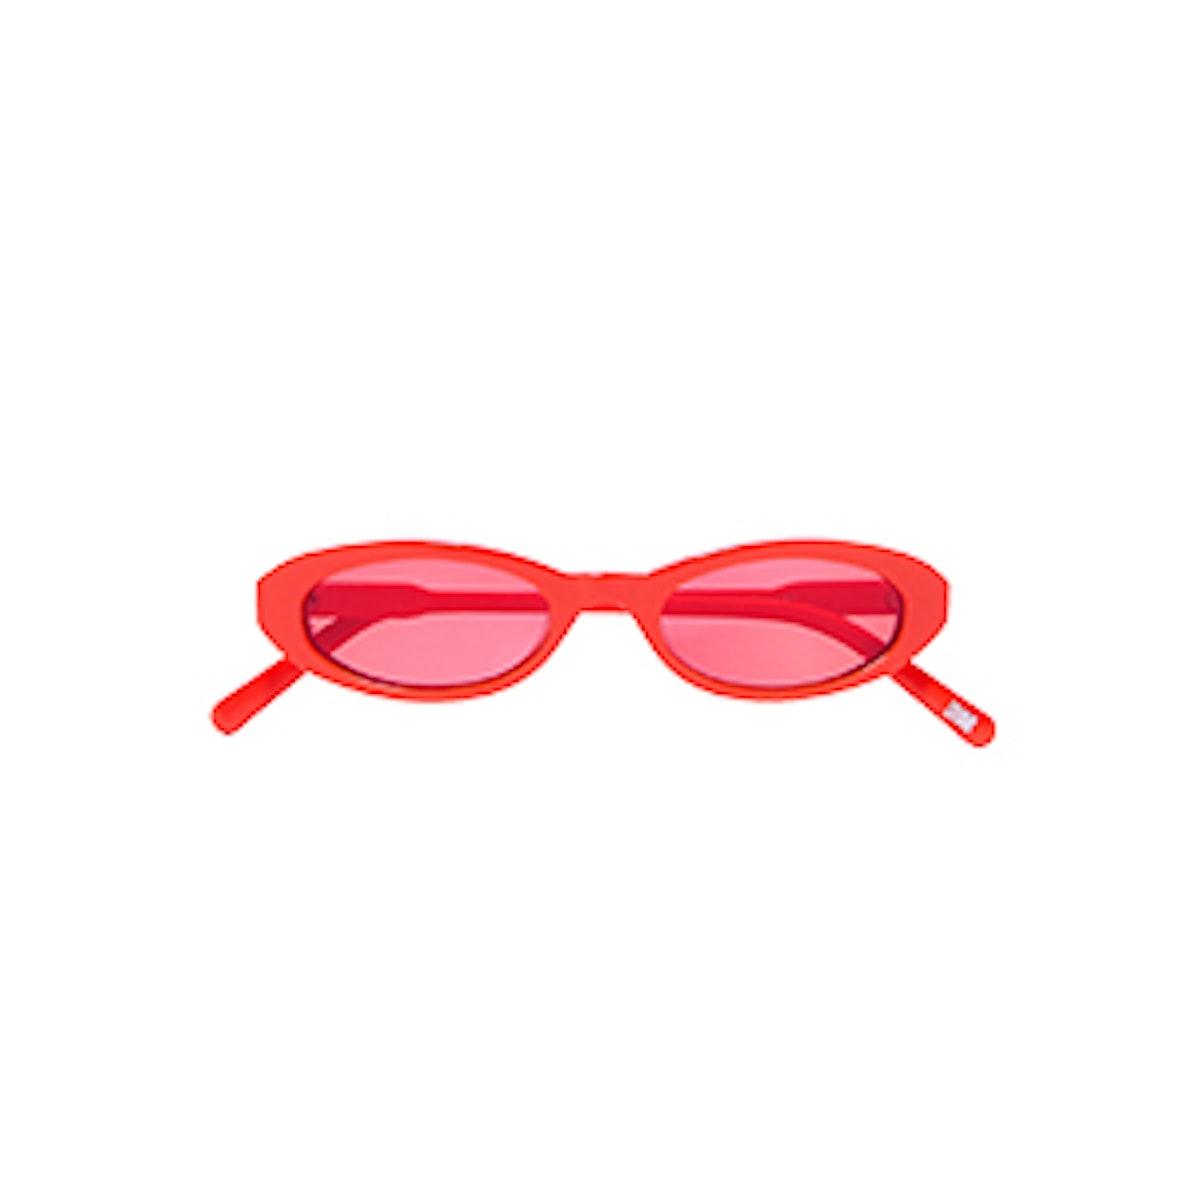 Joel Ighe Oval-Frame Acetate Sunglasses